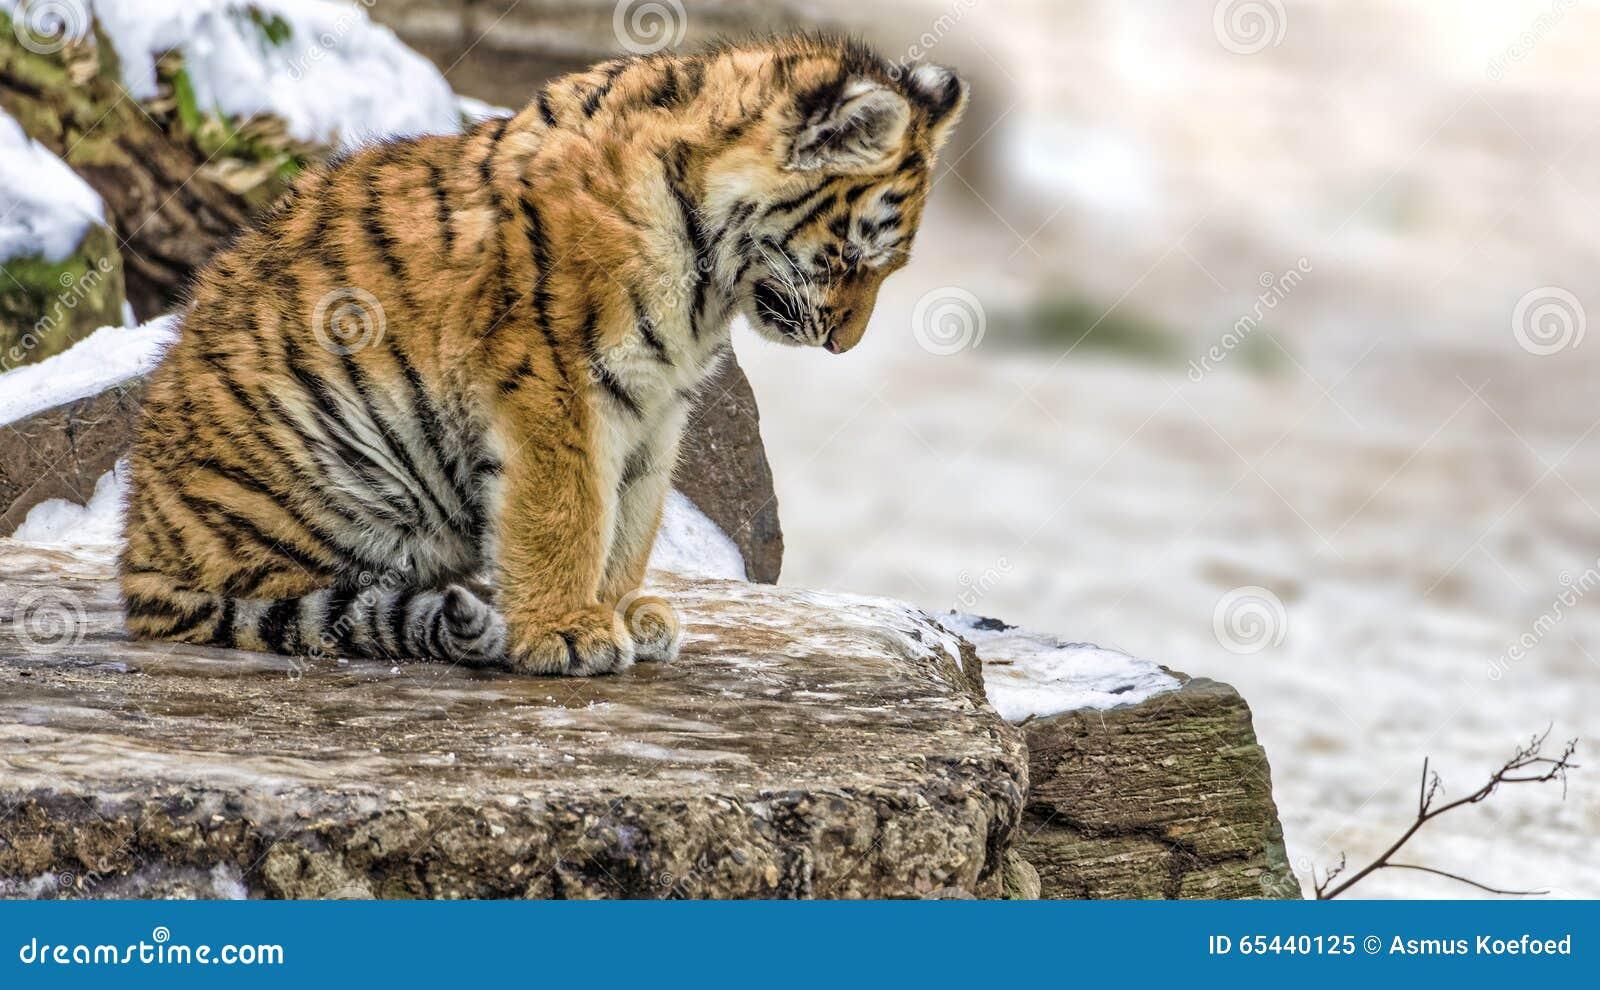 Depressed Or Sad Yet Cute Siberian Tiger Cub Stock Image ... Cute Siberian Tiger Cubs